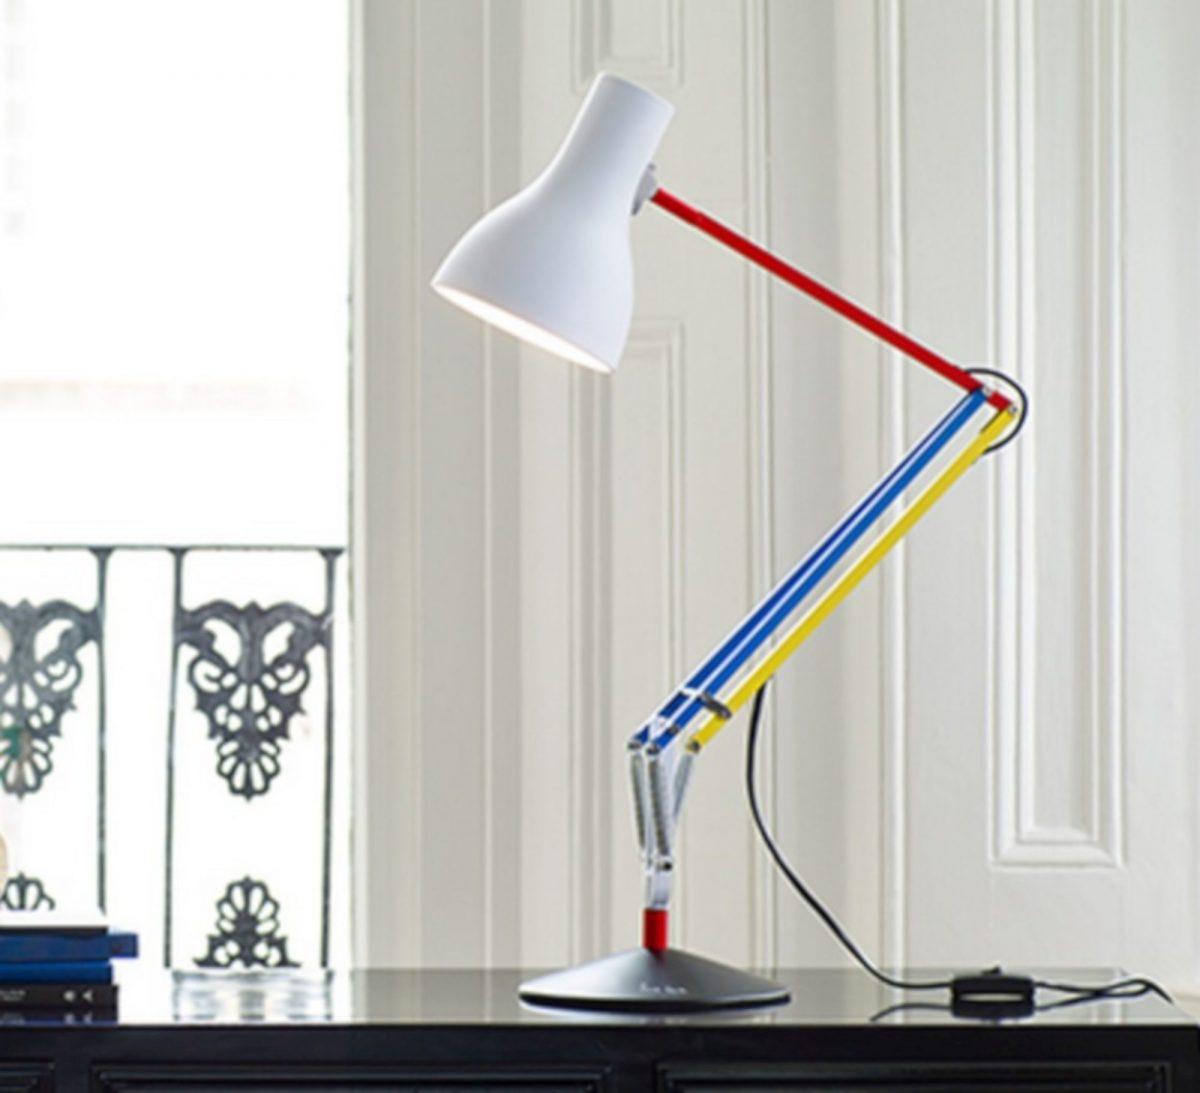 10nedgislampe-de-bureau-type-75-paul-smith-edition-three-multicolore-h57cm-anglepoise-1200x1200.jpg